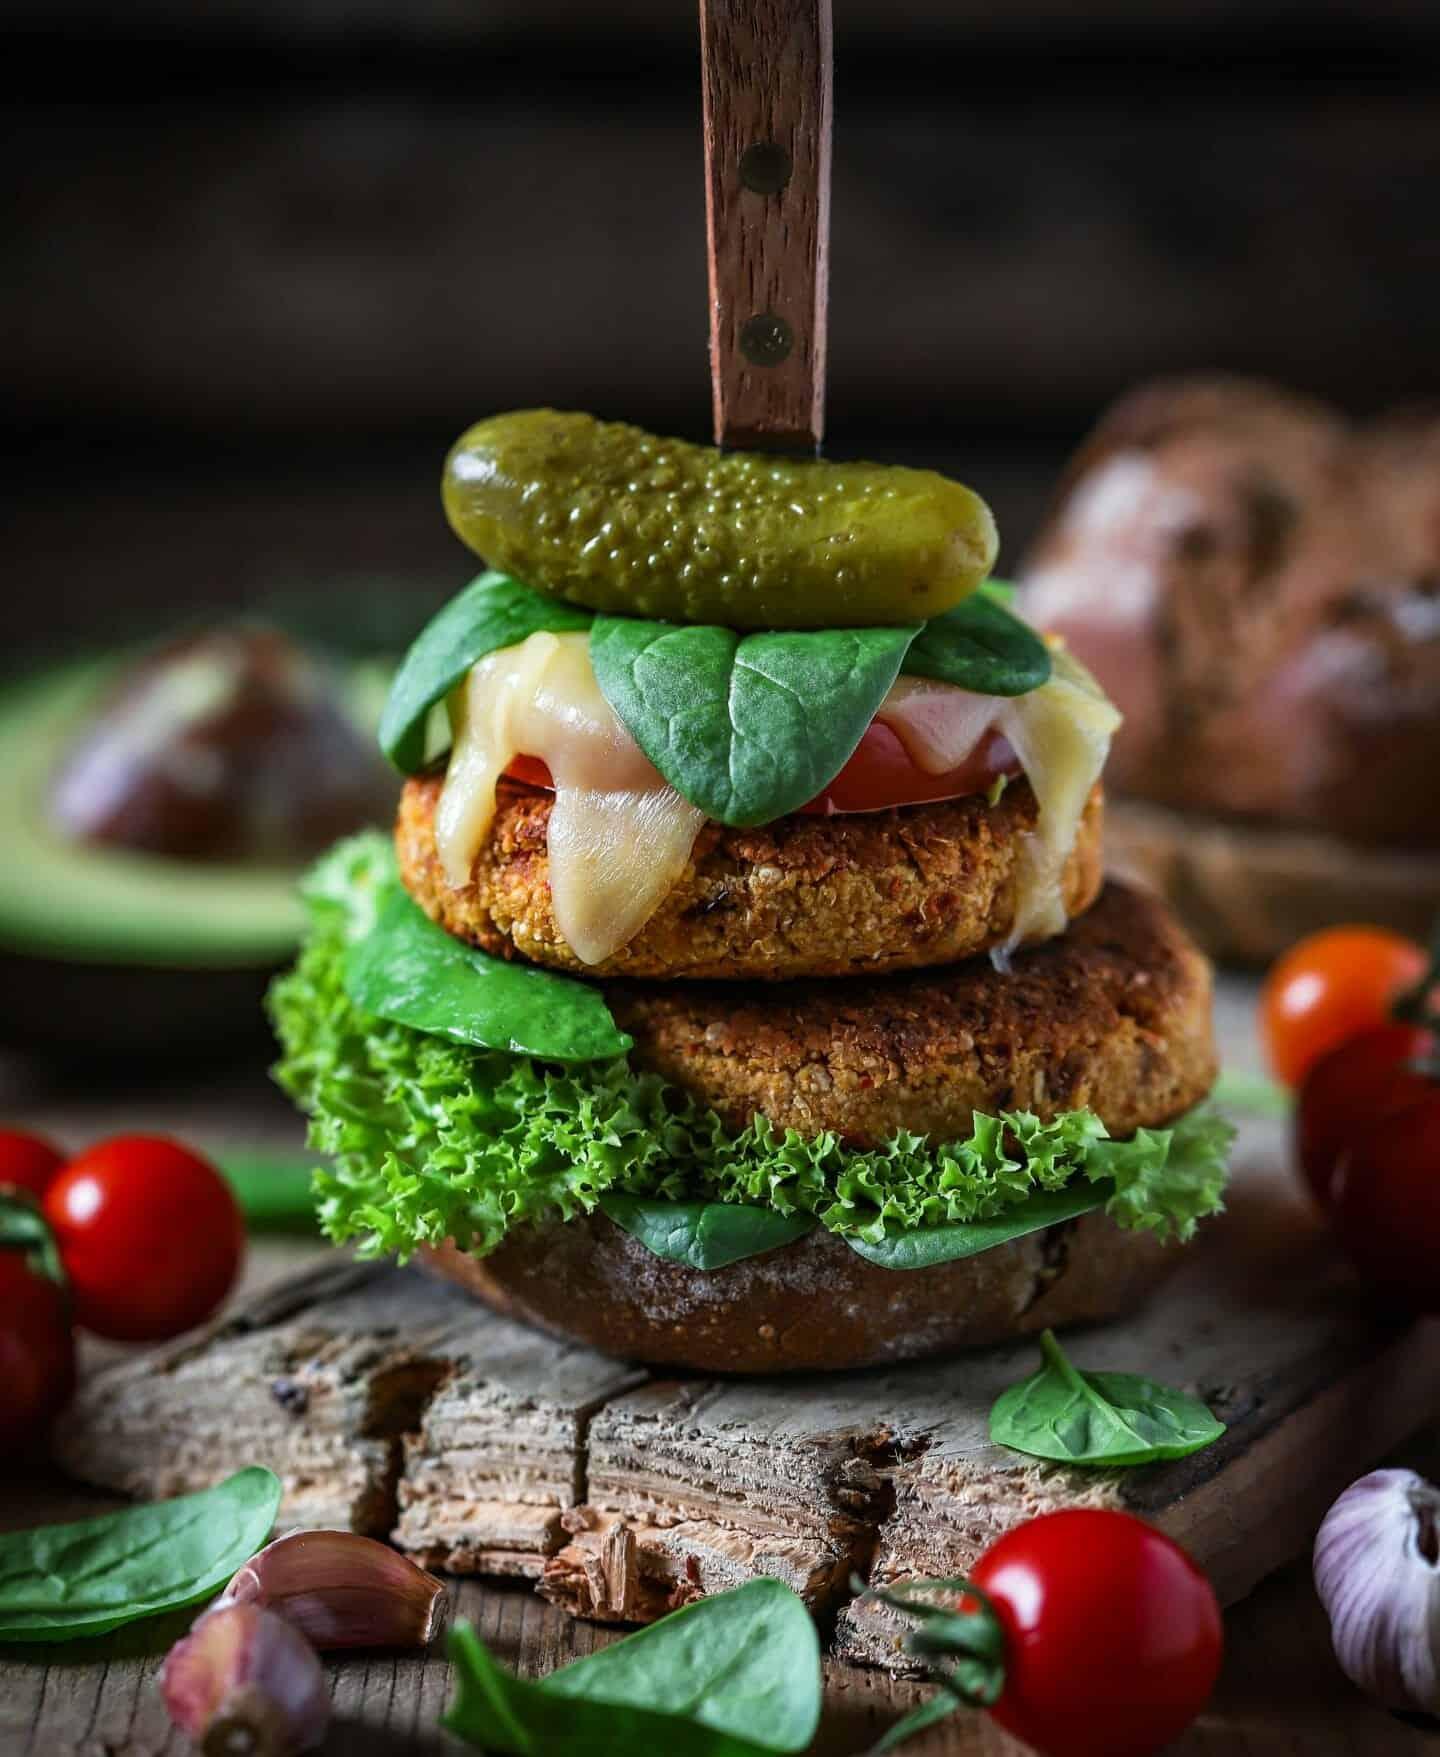 Crispy Harissa Falafel Bianca Zapatka Foodblog